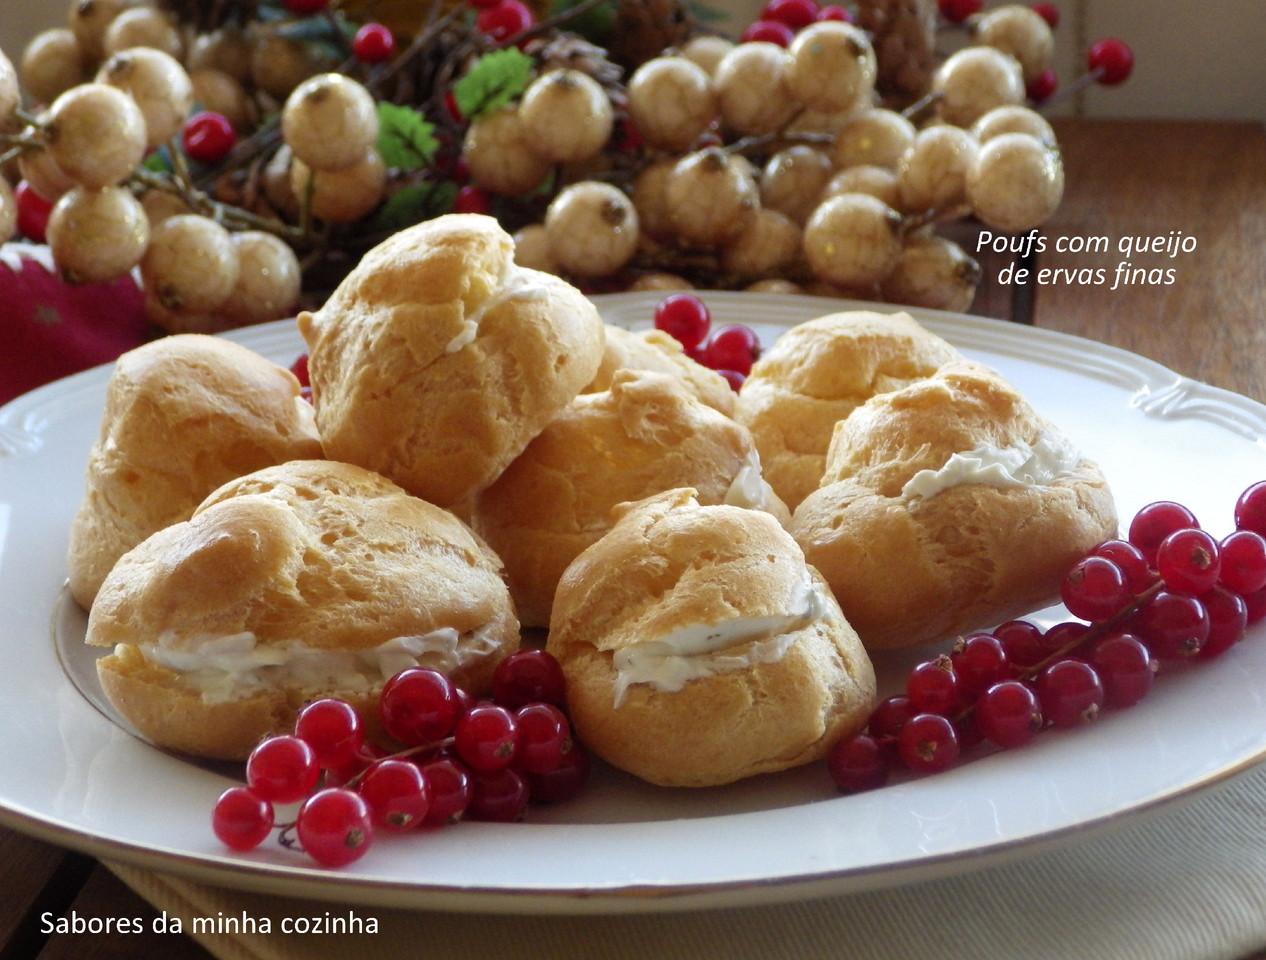 IMGP5524-Poufs com queijo de ervas-Blog.JPG